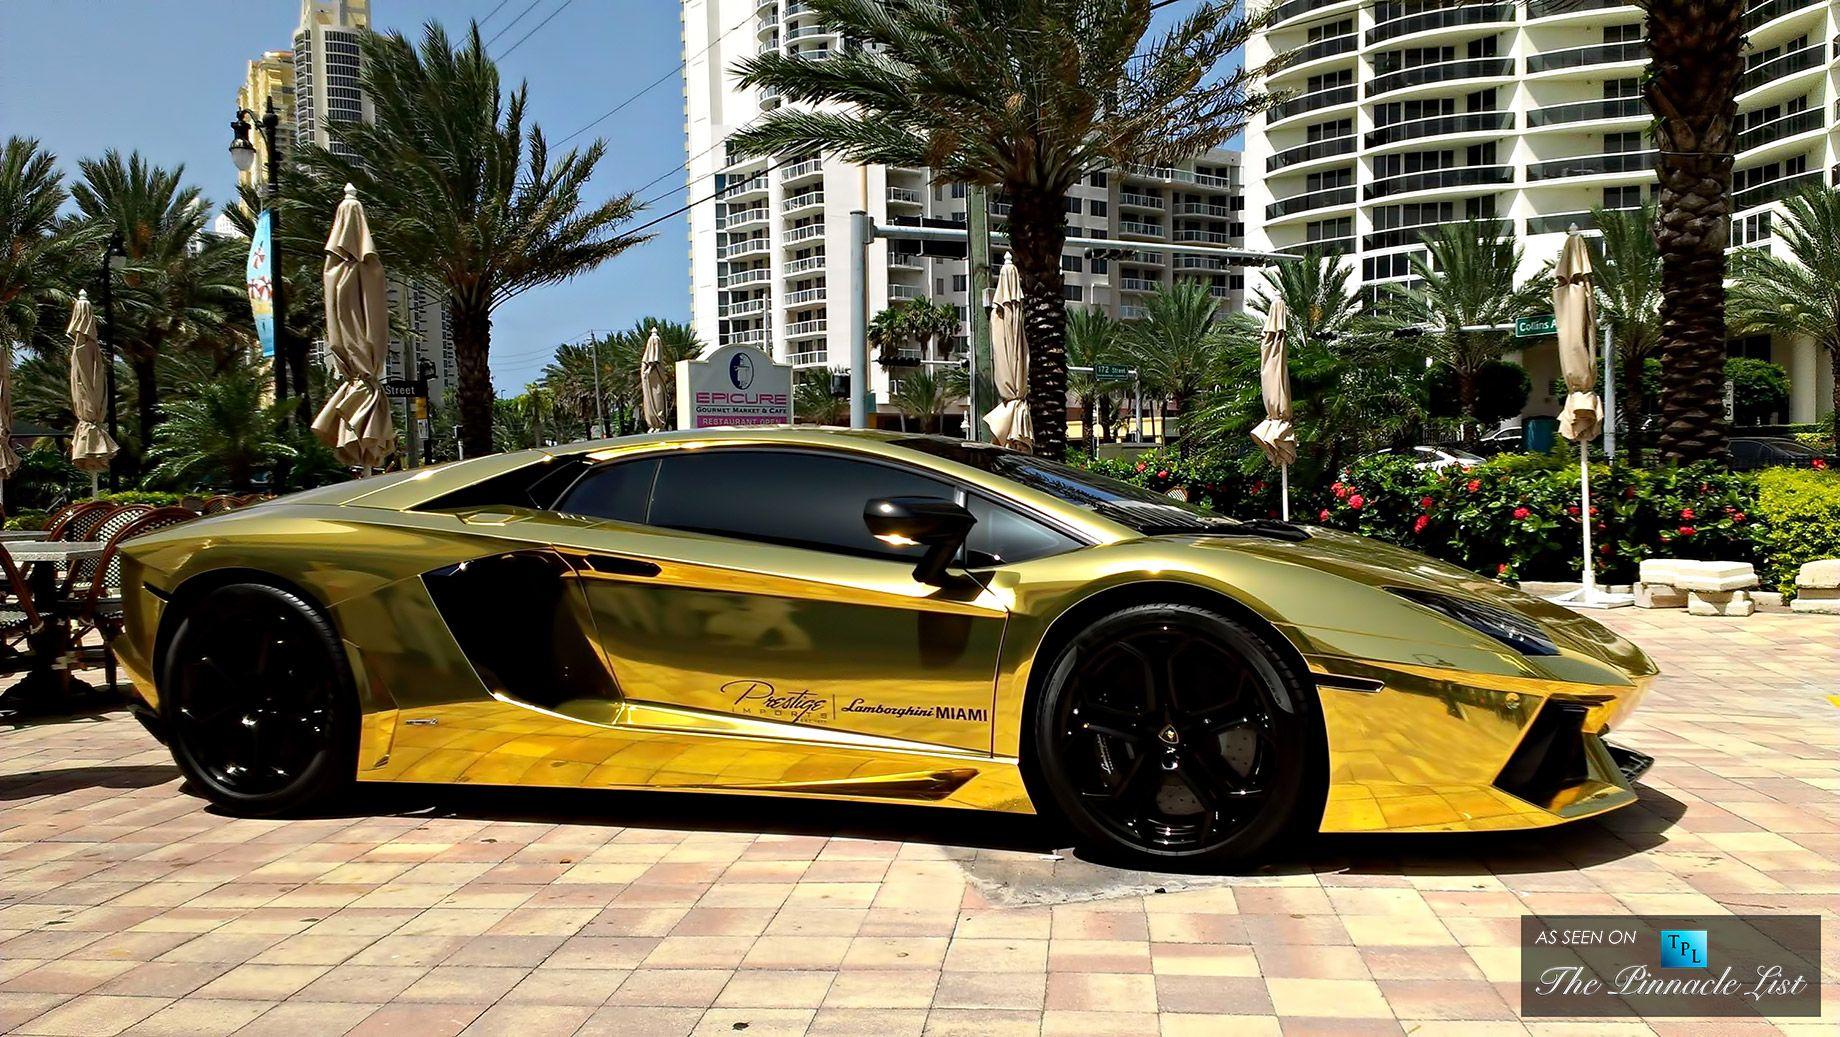 The Top Five Most Uber Expensive Luxury Supercars In The World Lamborghini Aventador Lamborghini Veneno Gold Lamborghini